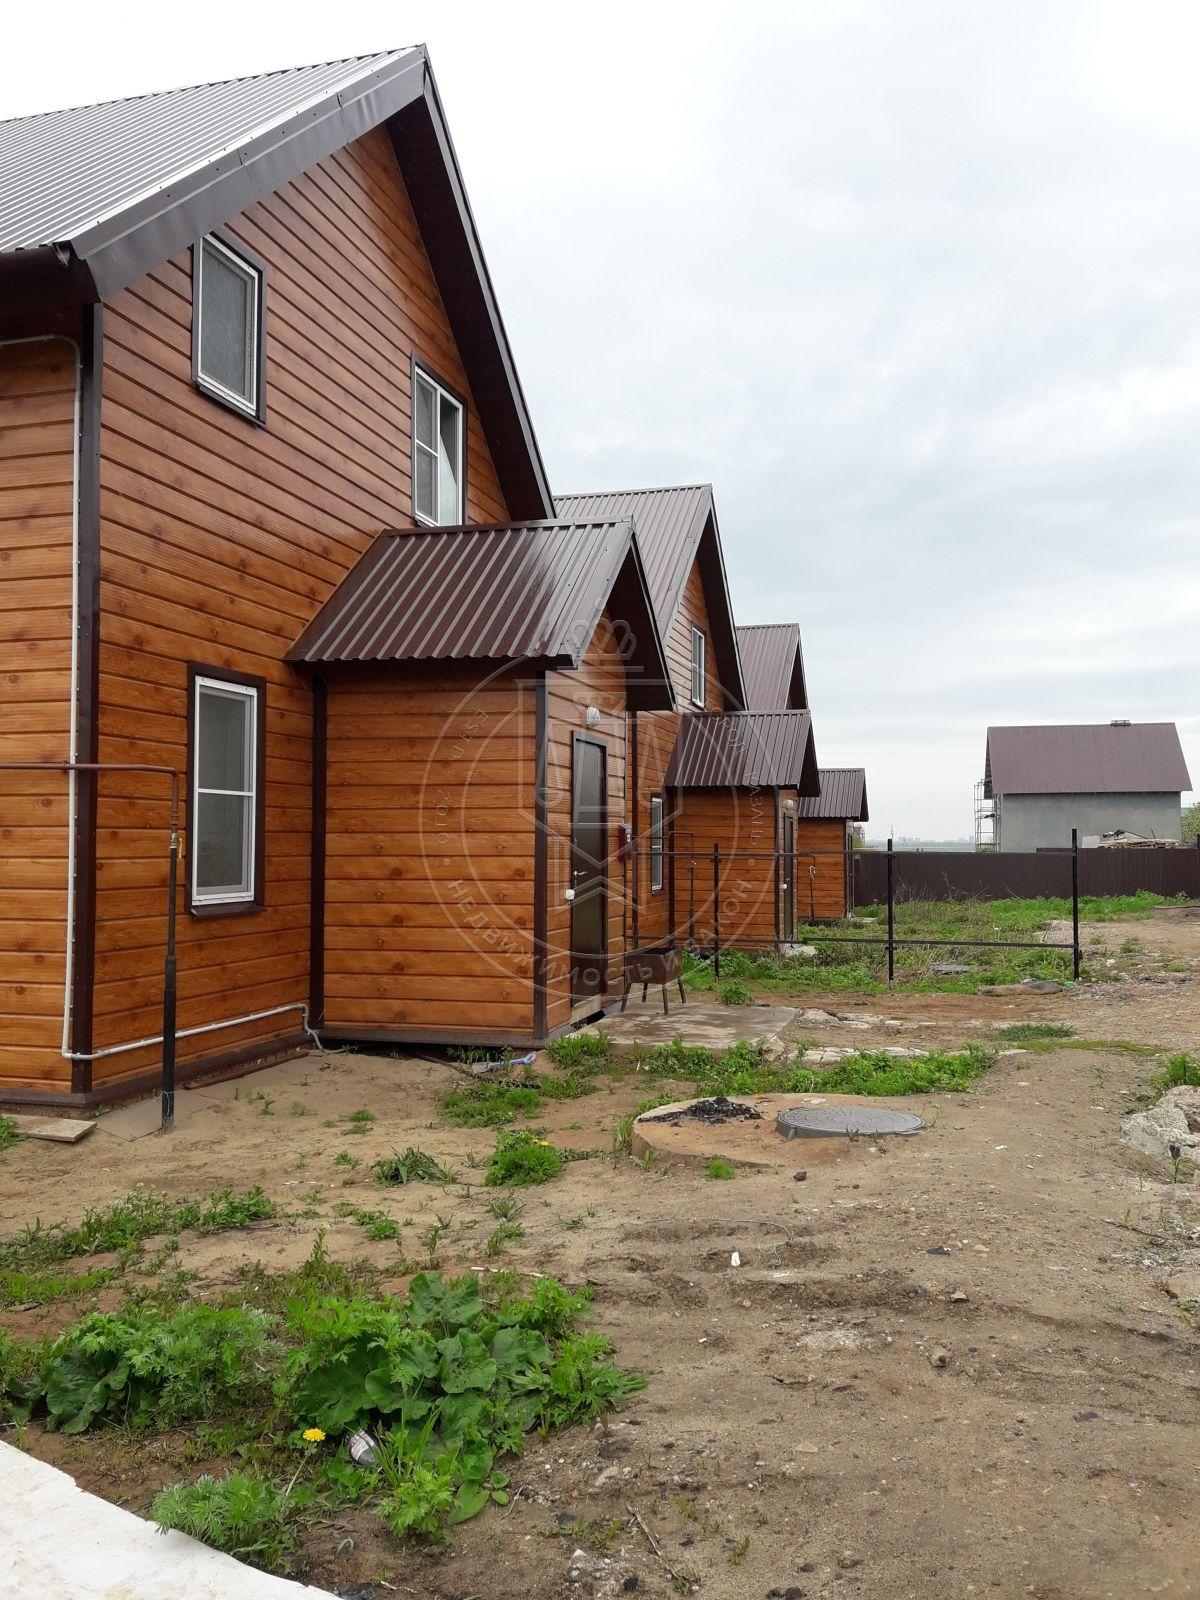 Продажа  дома п. Куюки, ул Центральная, 100.0 м² (миниатюра №9)